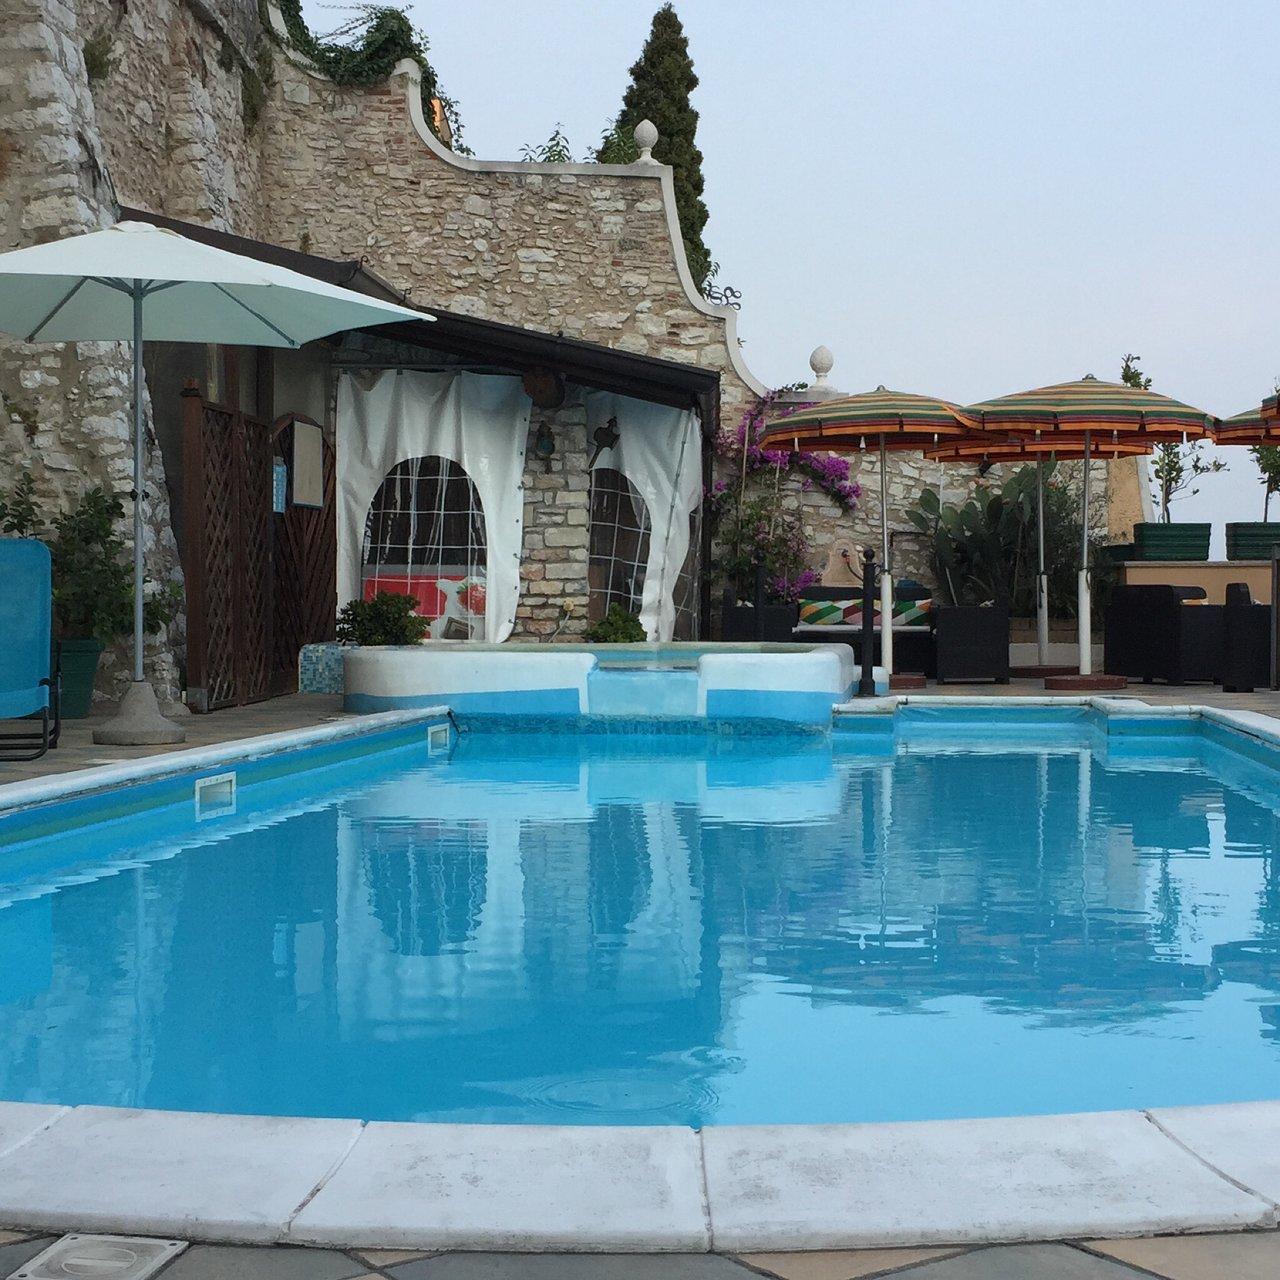 GARDA SOL APART-HOTEL & SPA ab 96€ (1̶3̶6̶€̶): Bewertungen, Fotos ...